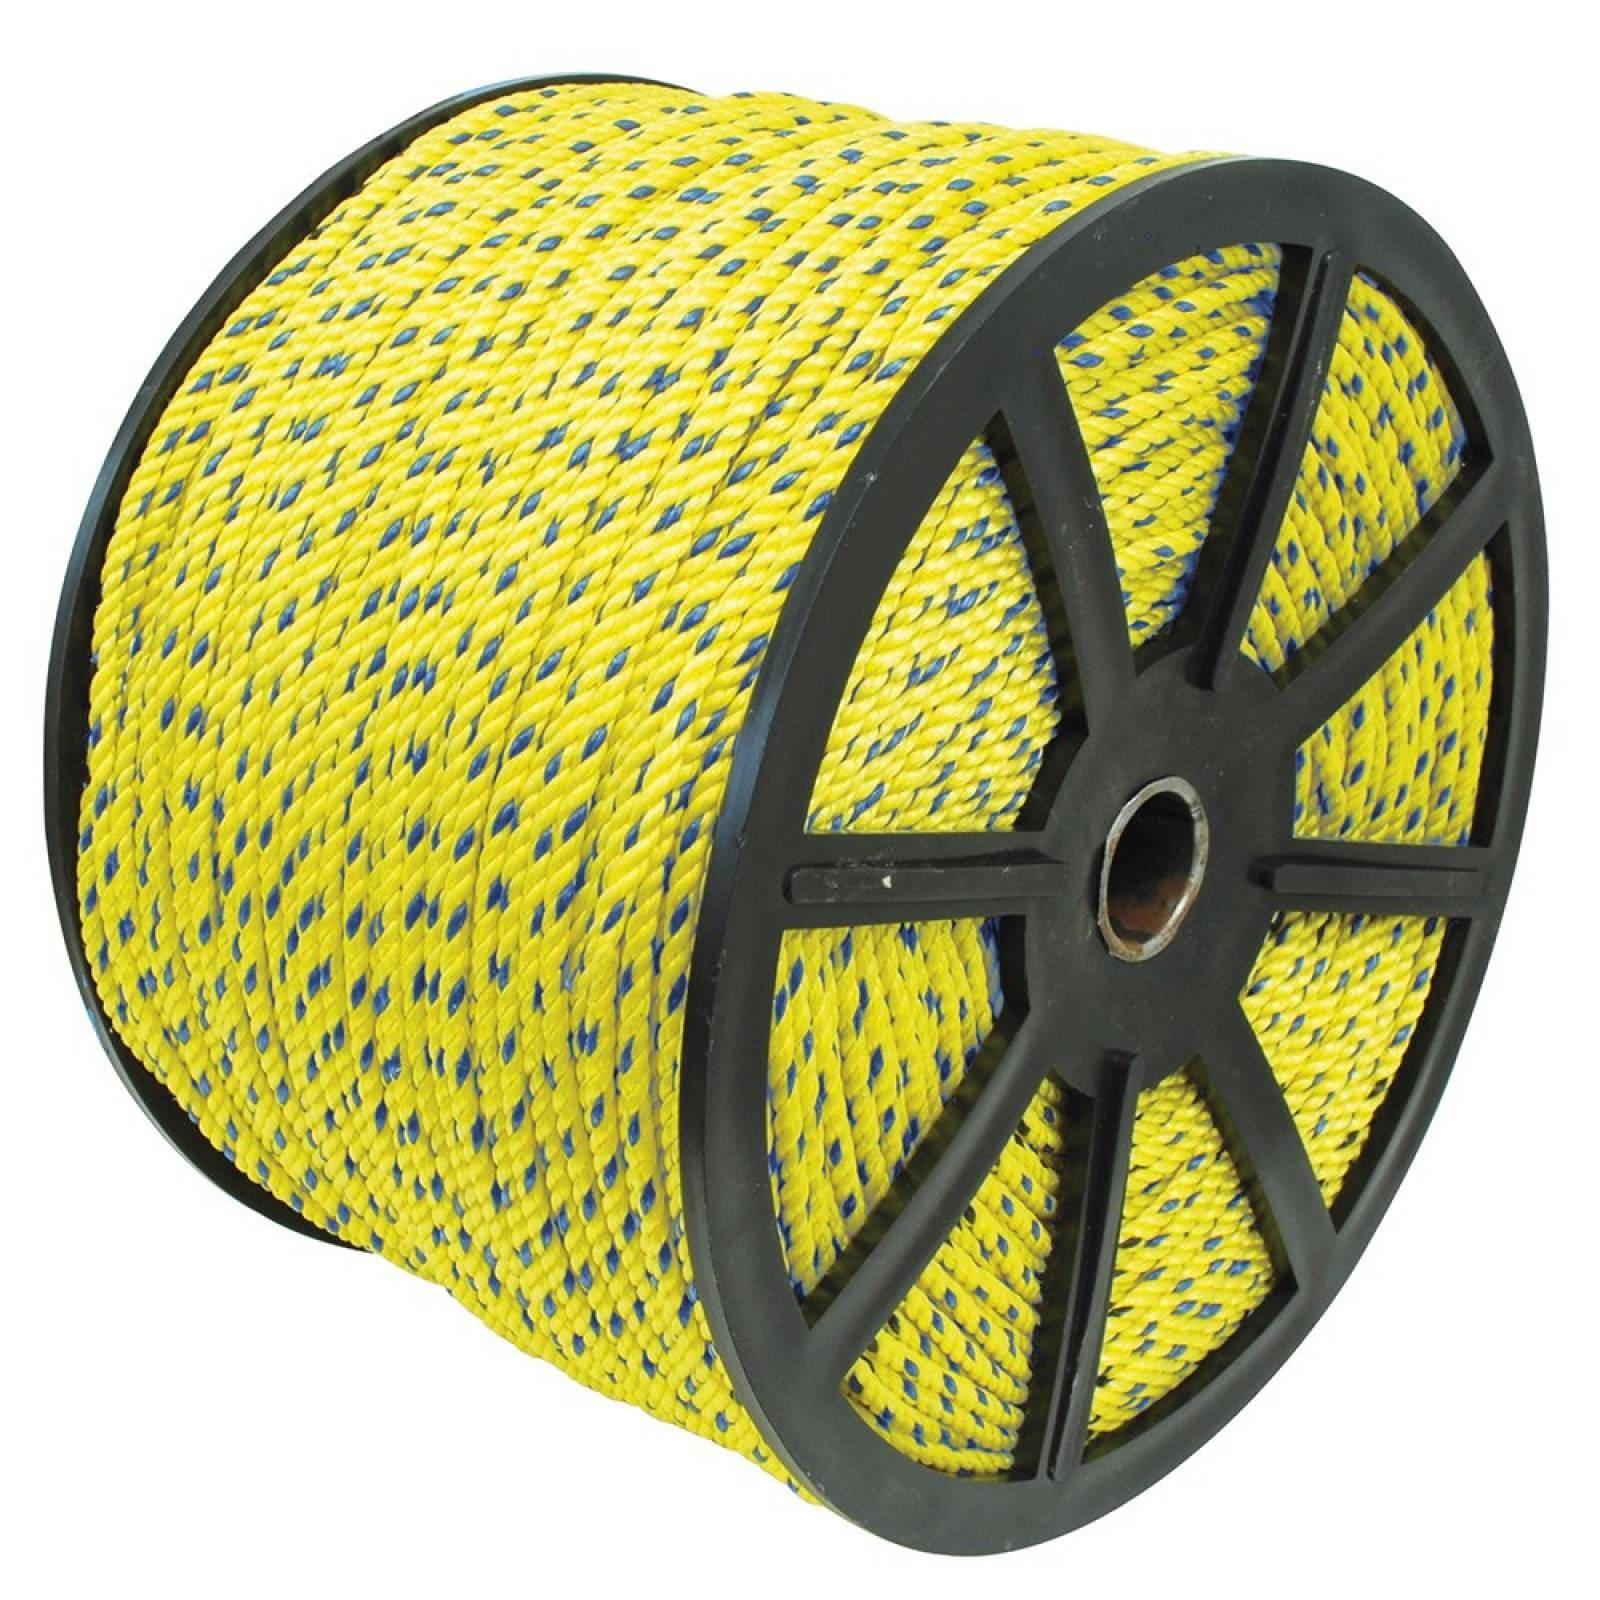 Cuerda de polipropileno 6 mm, 22 kg 138201 Surtek